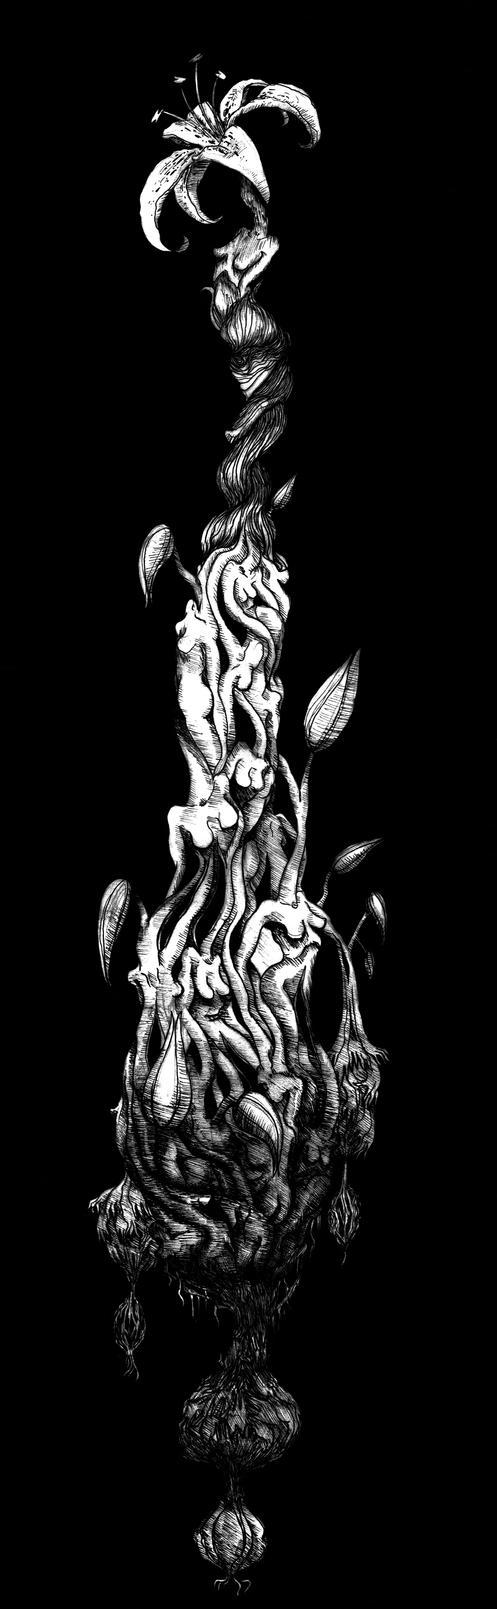 Tiger Lily by chinakappu